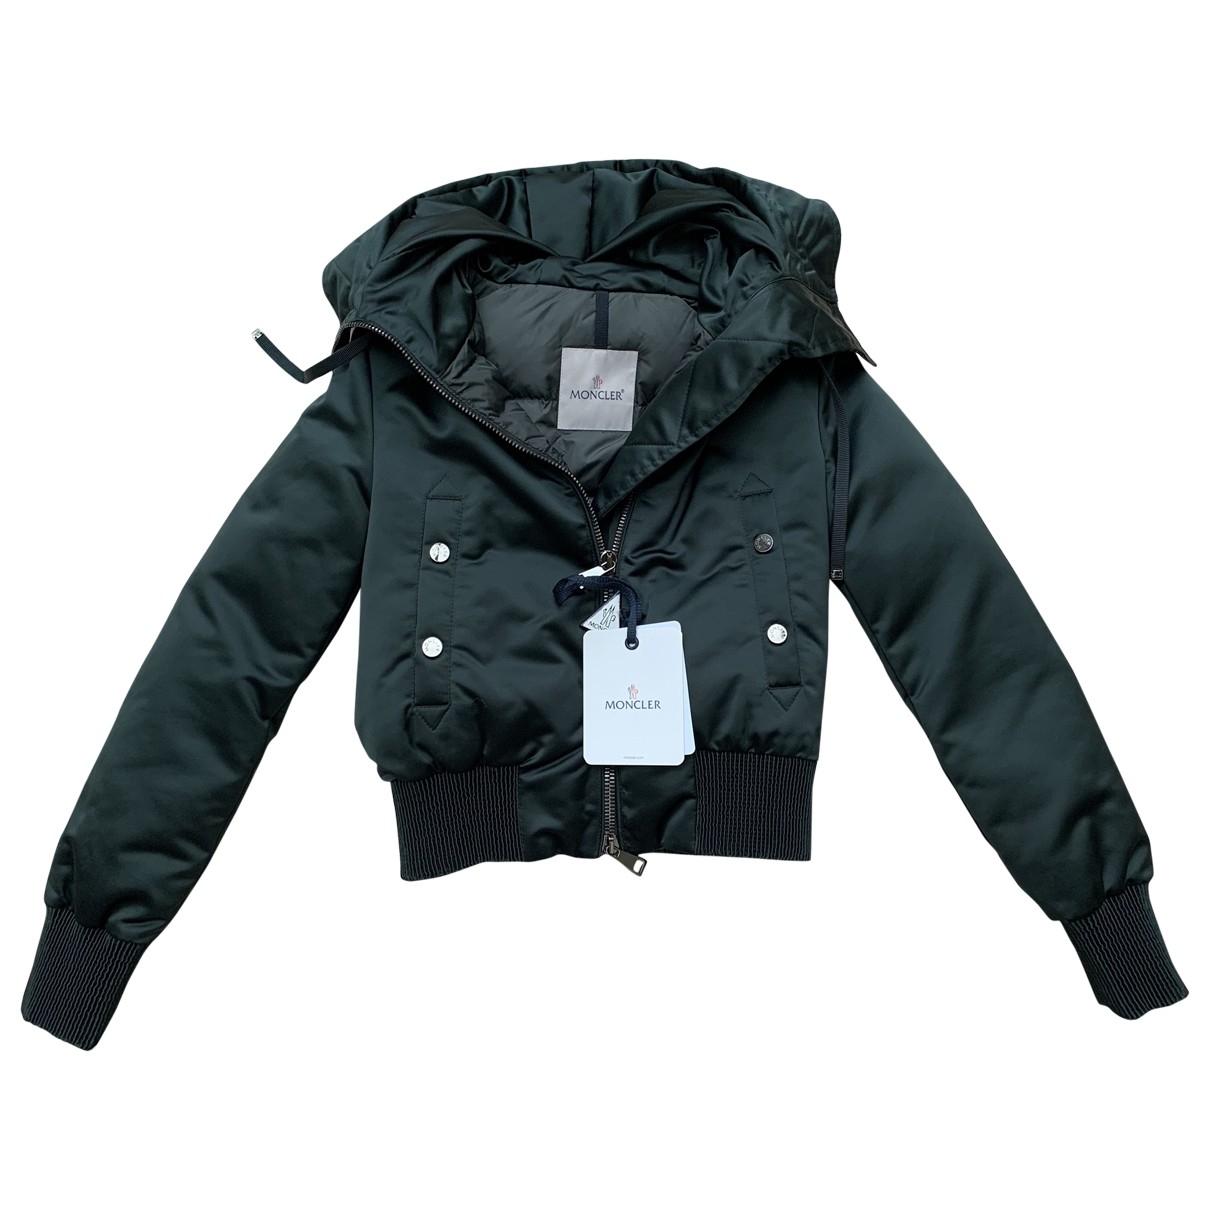 Moncler \N Green jacket for Women 38 IT